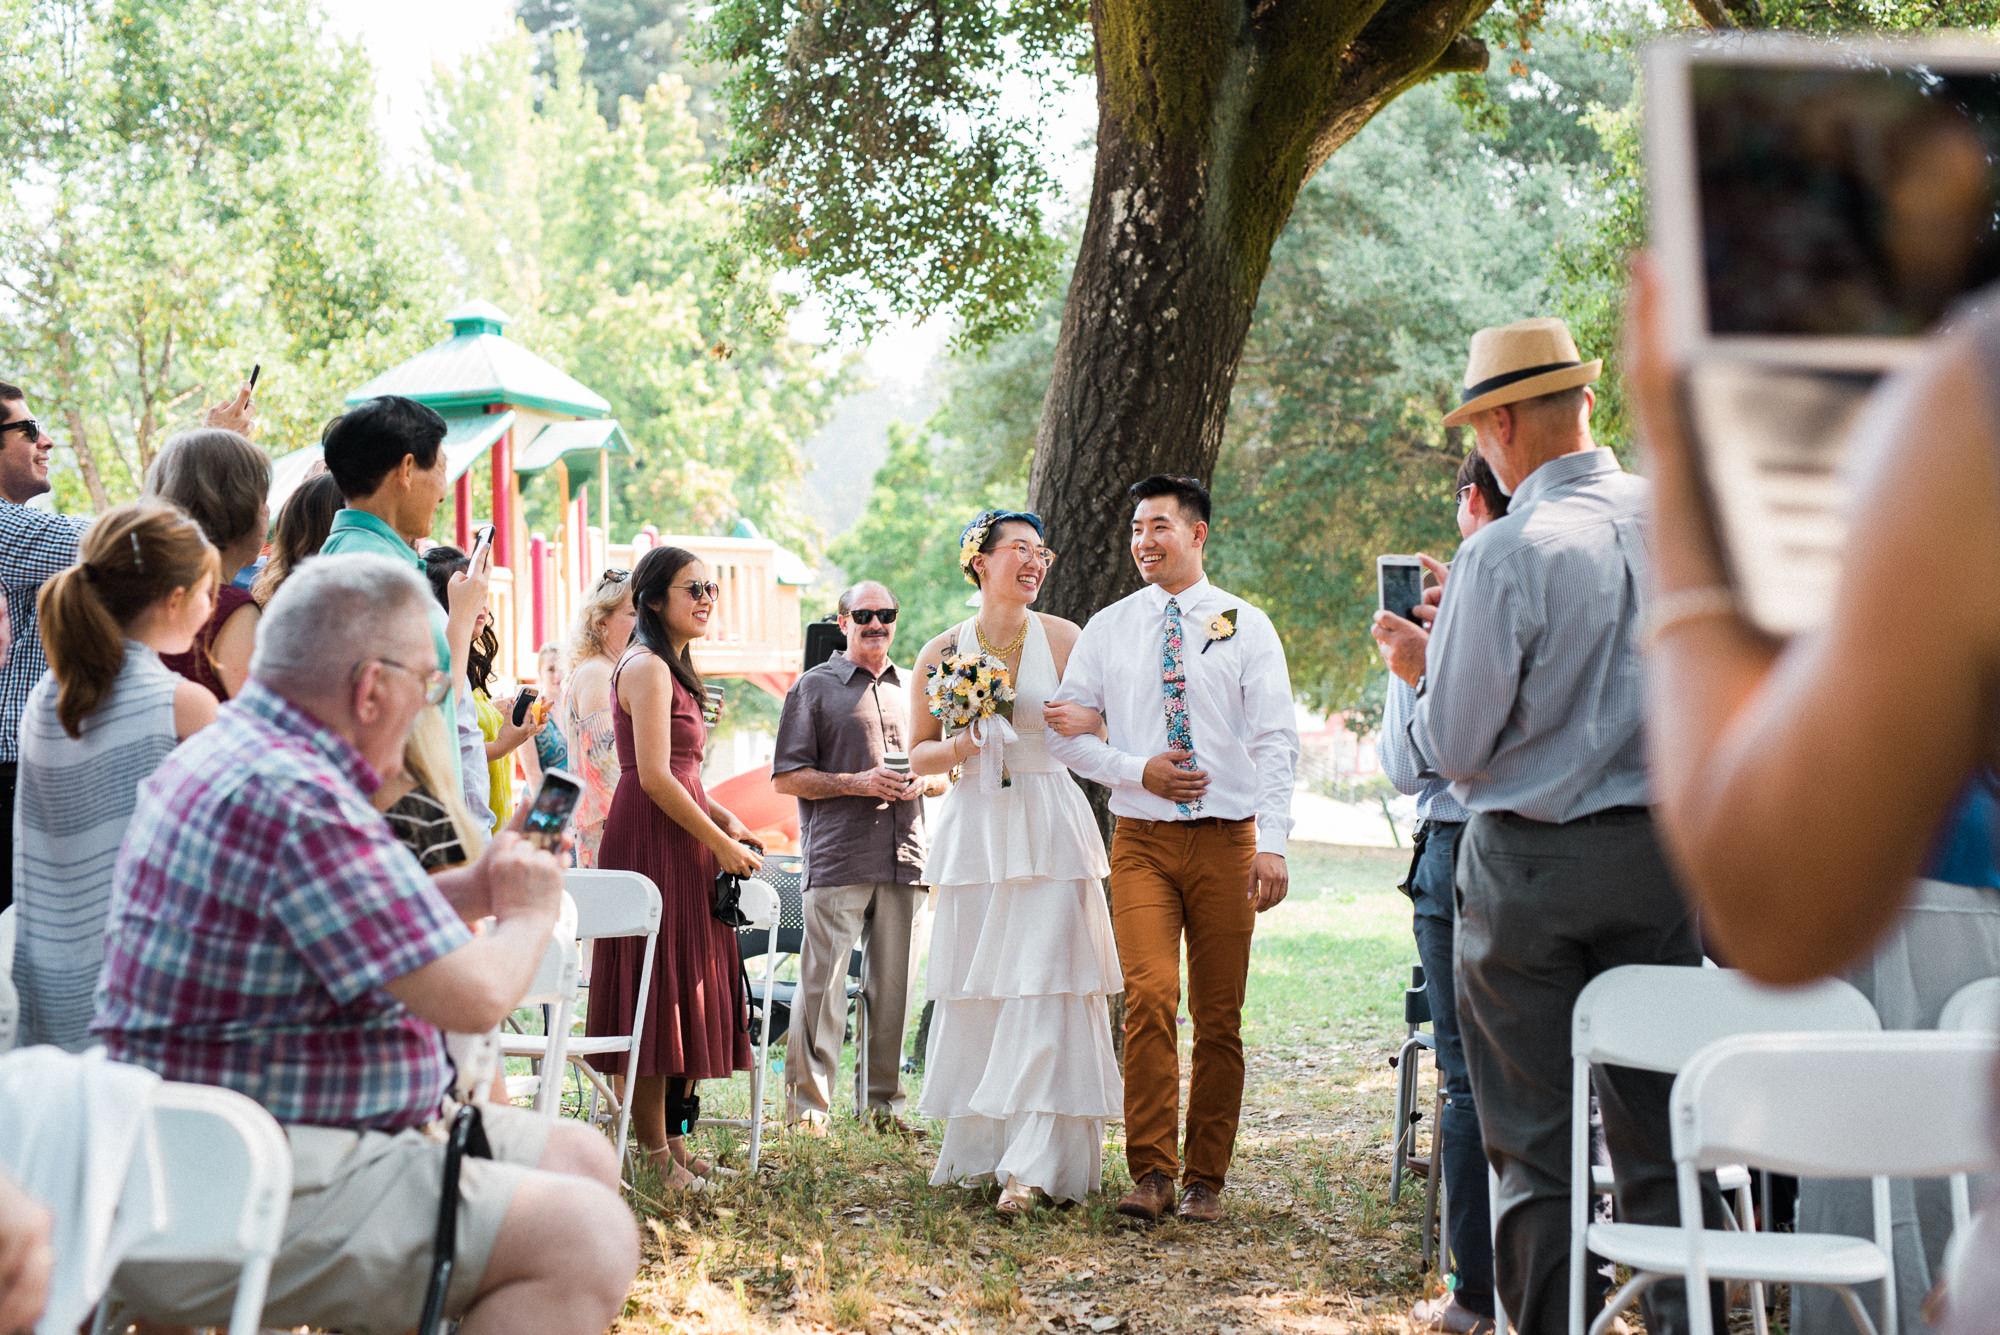 Monte Rio Community Center Wedding 029.jpg